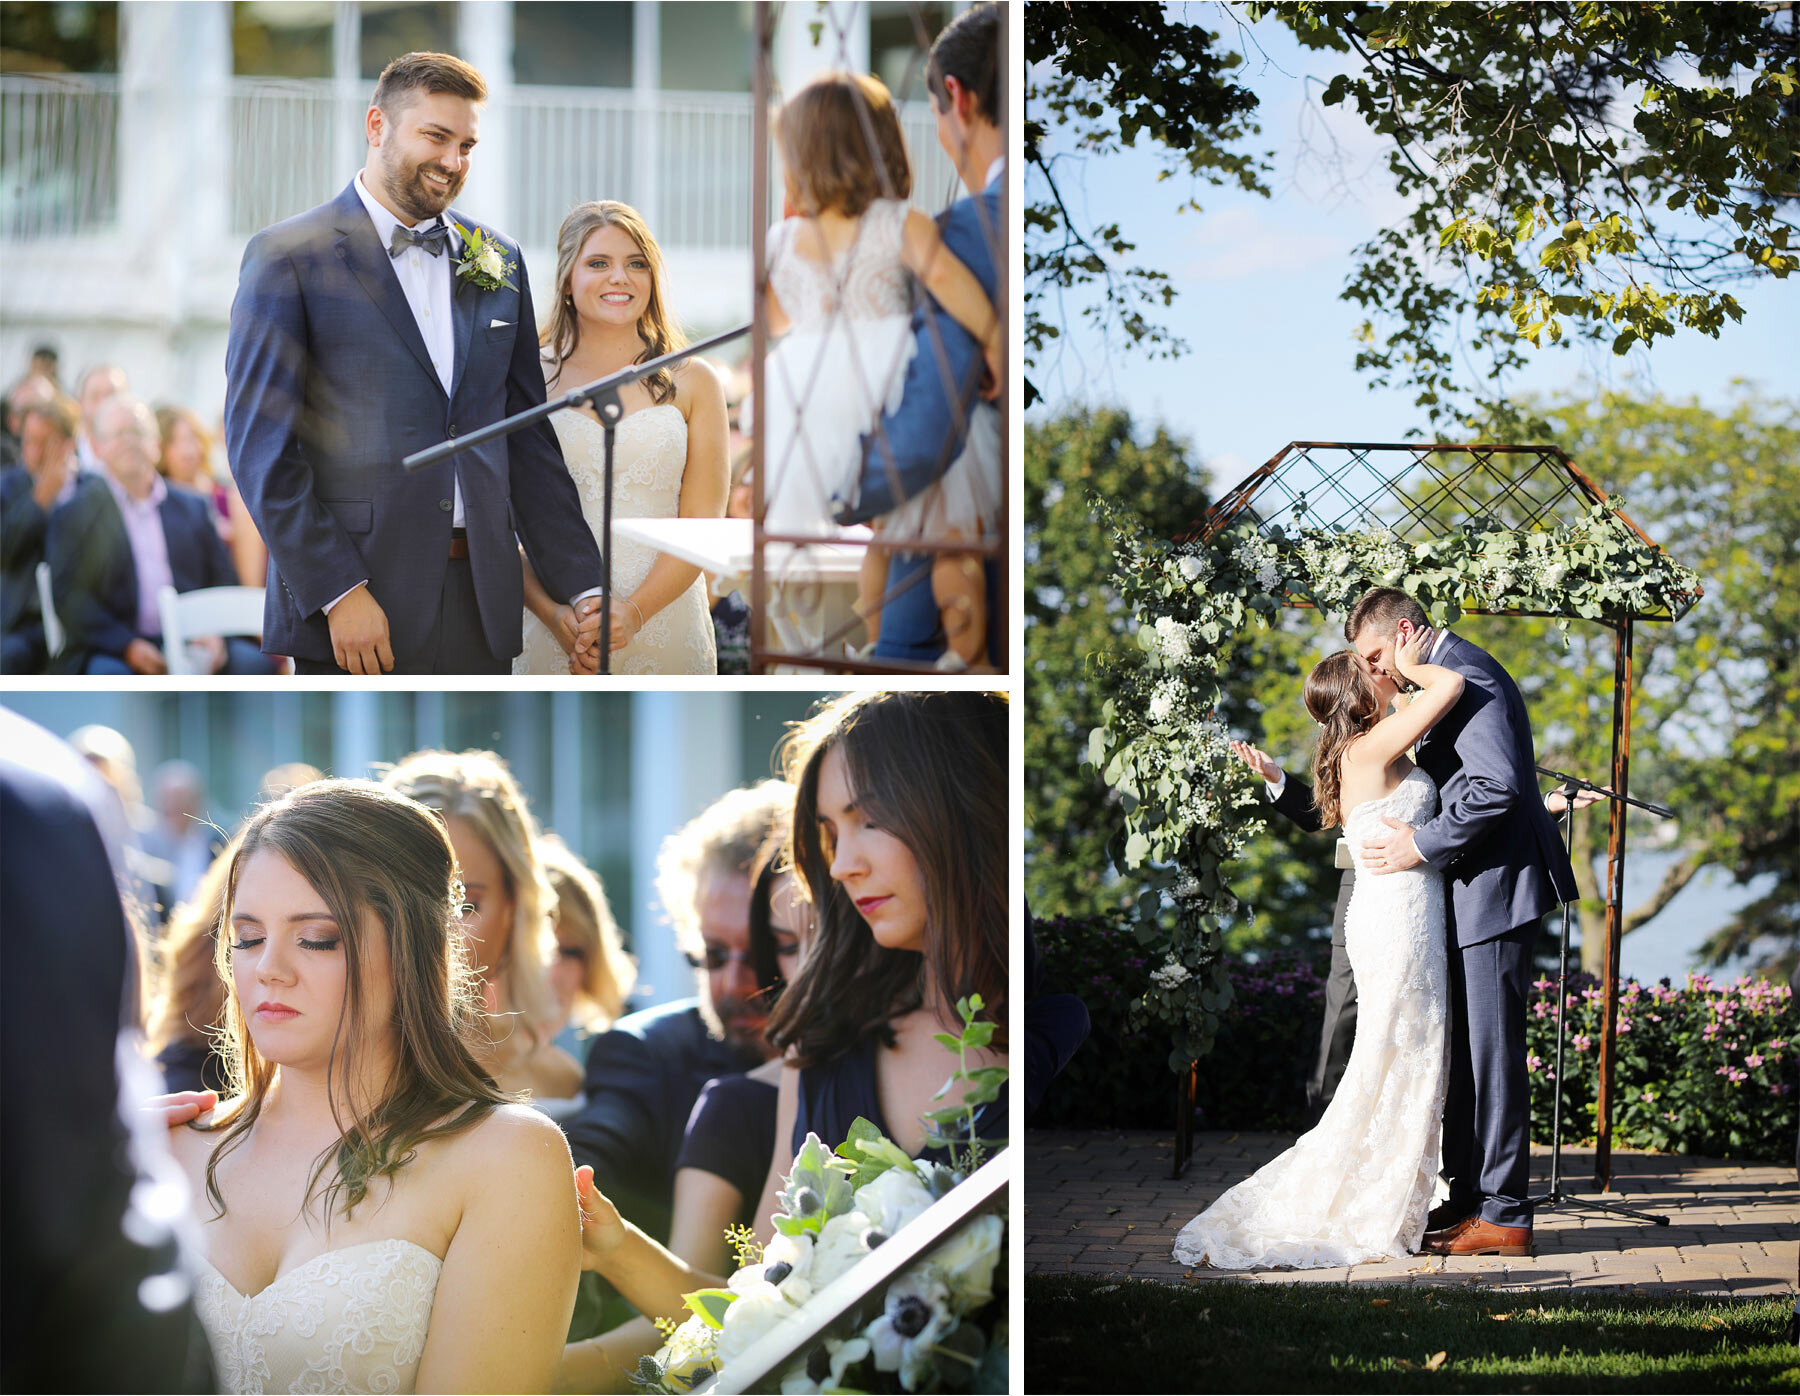 15-Vick-Photography-Wedding-Minnetonka-Minnesota-Lafayette-Club-Outdoor-Ceremony-Katie-and-David.jpg